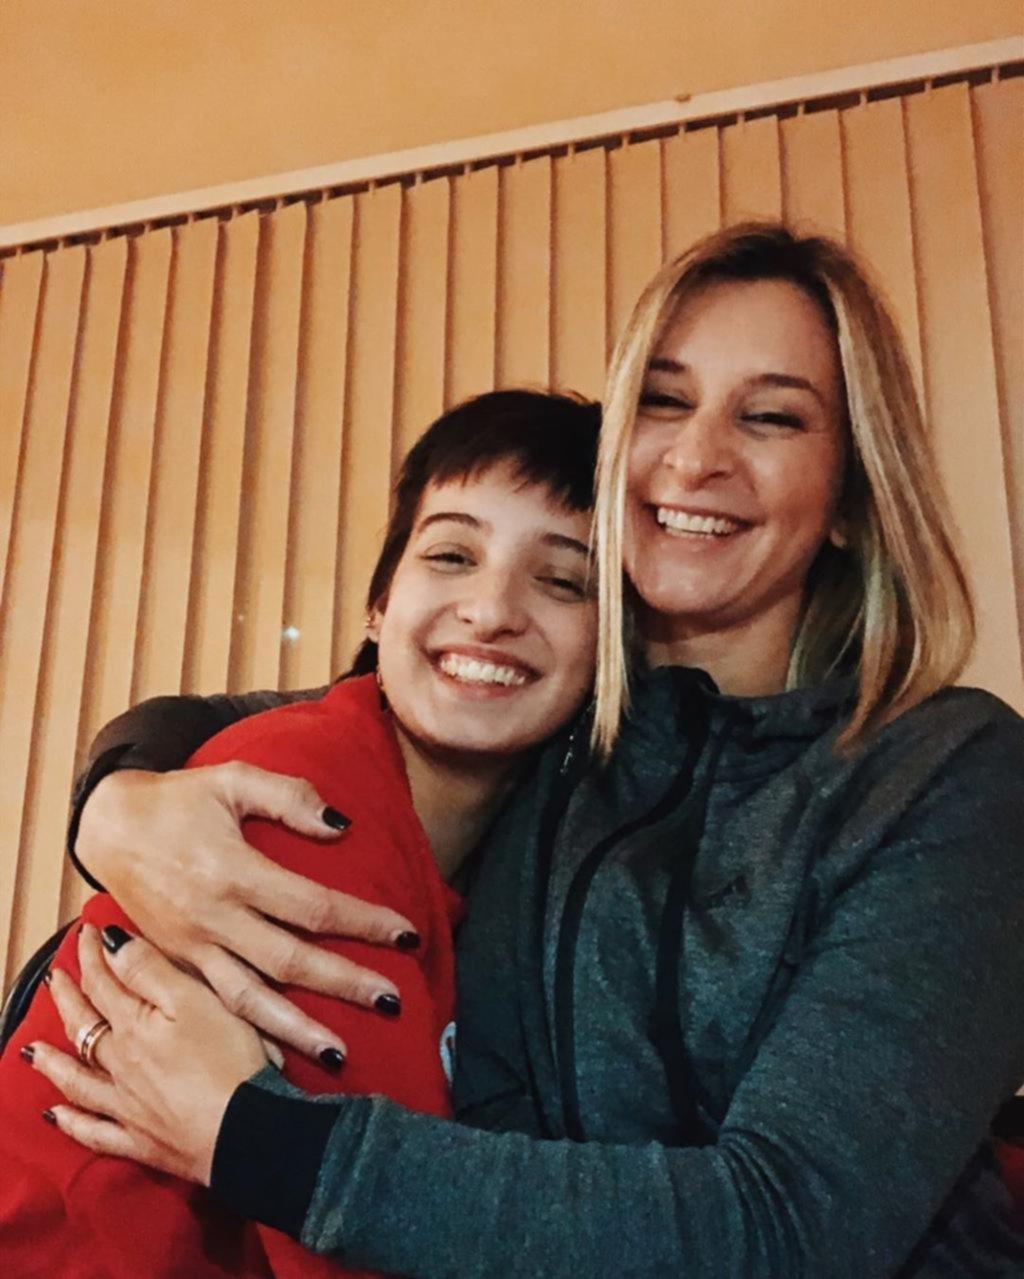 Tras meses de ausencia, reapareció la periodista Mariela Fernández